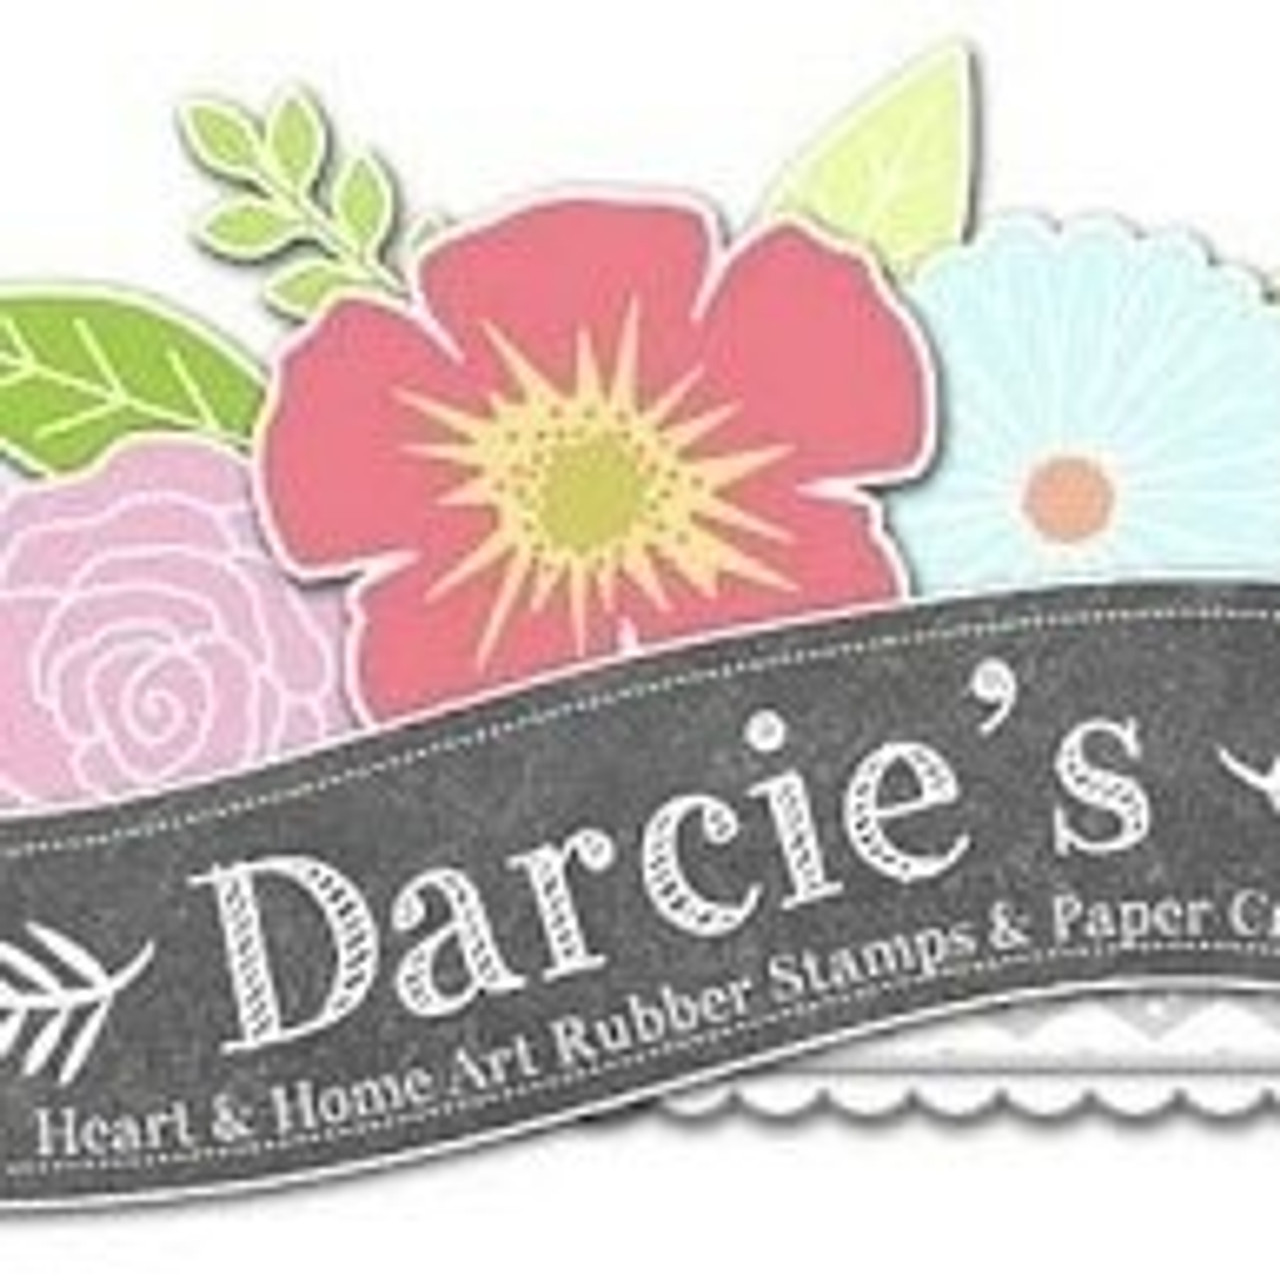 Darcie's Heart & Home